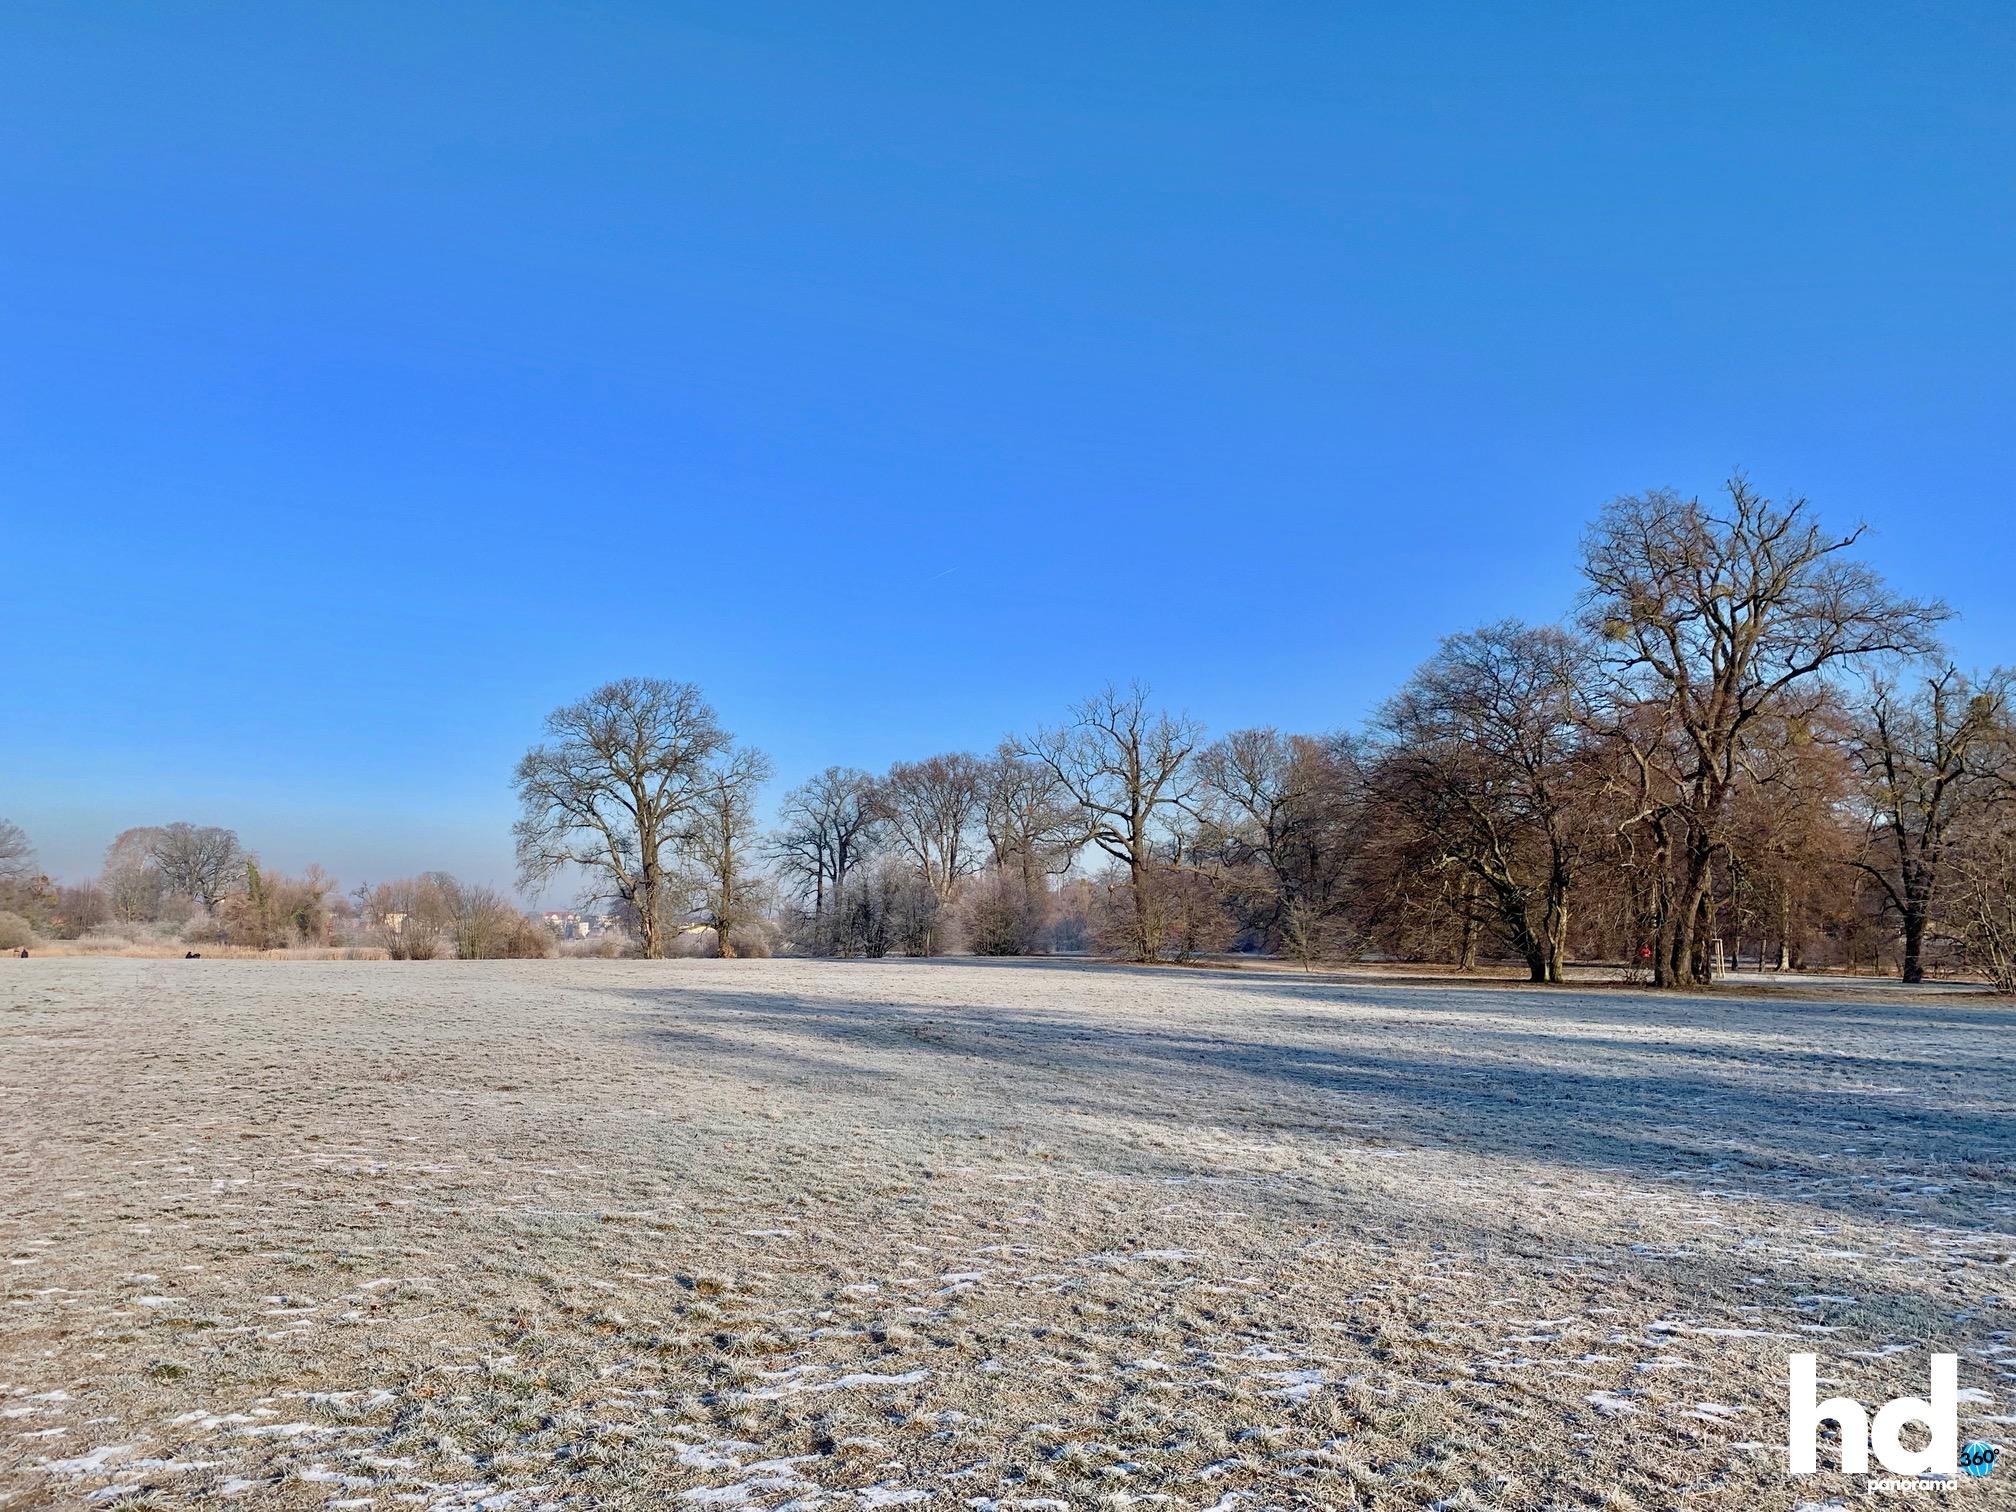 Park Babelsberg: Alles sehr frostig - HD-Panorama © René Blanke